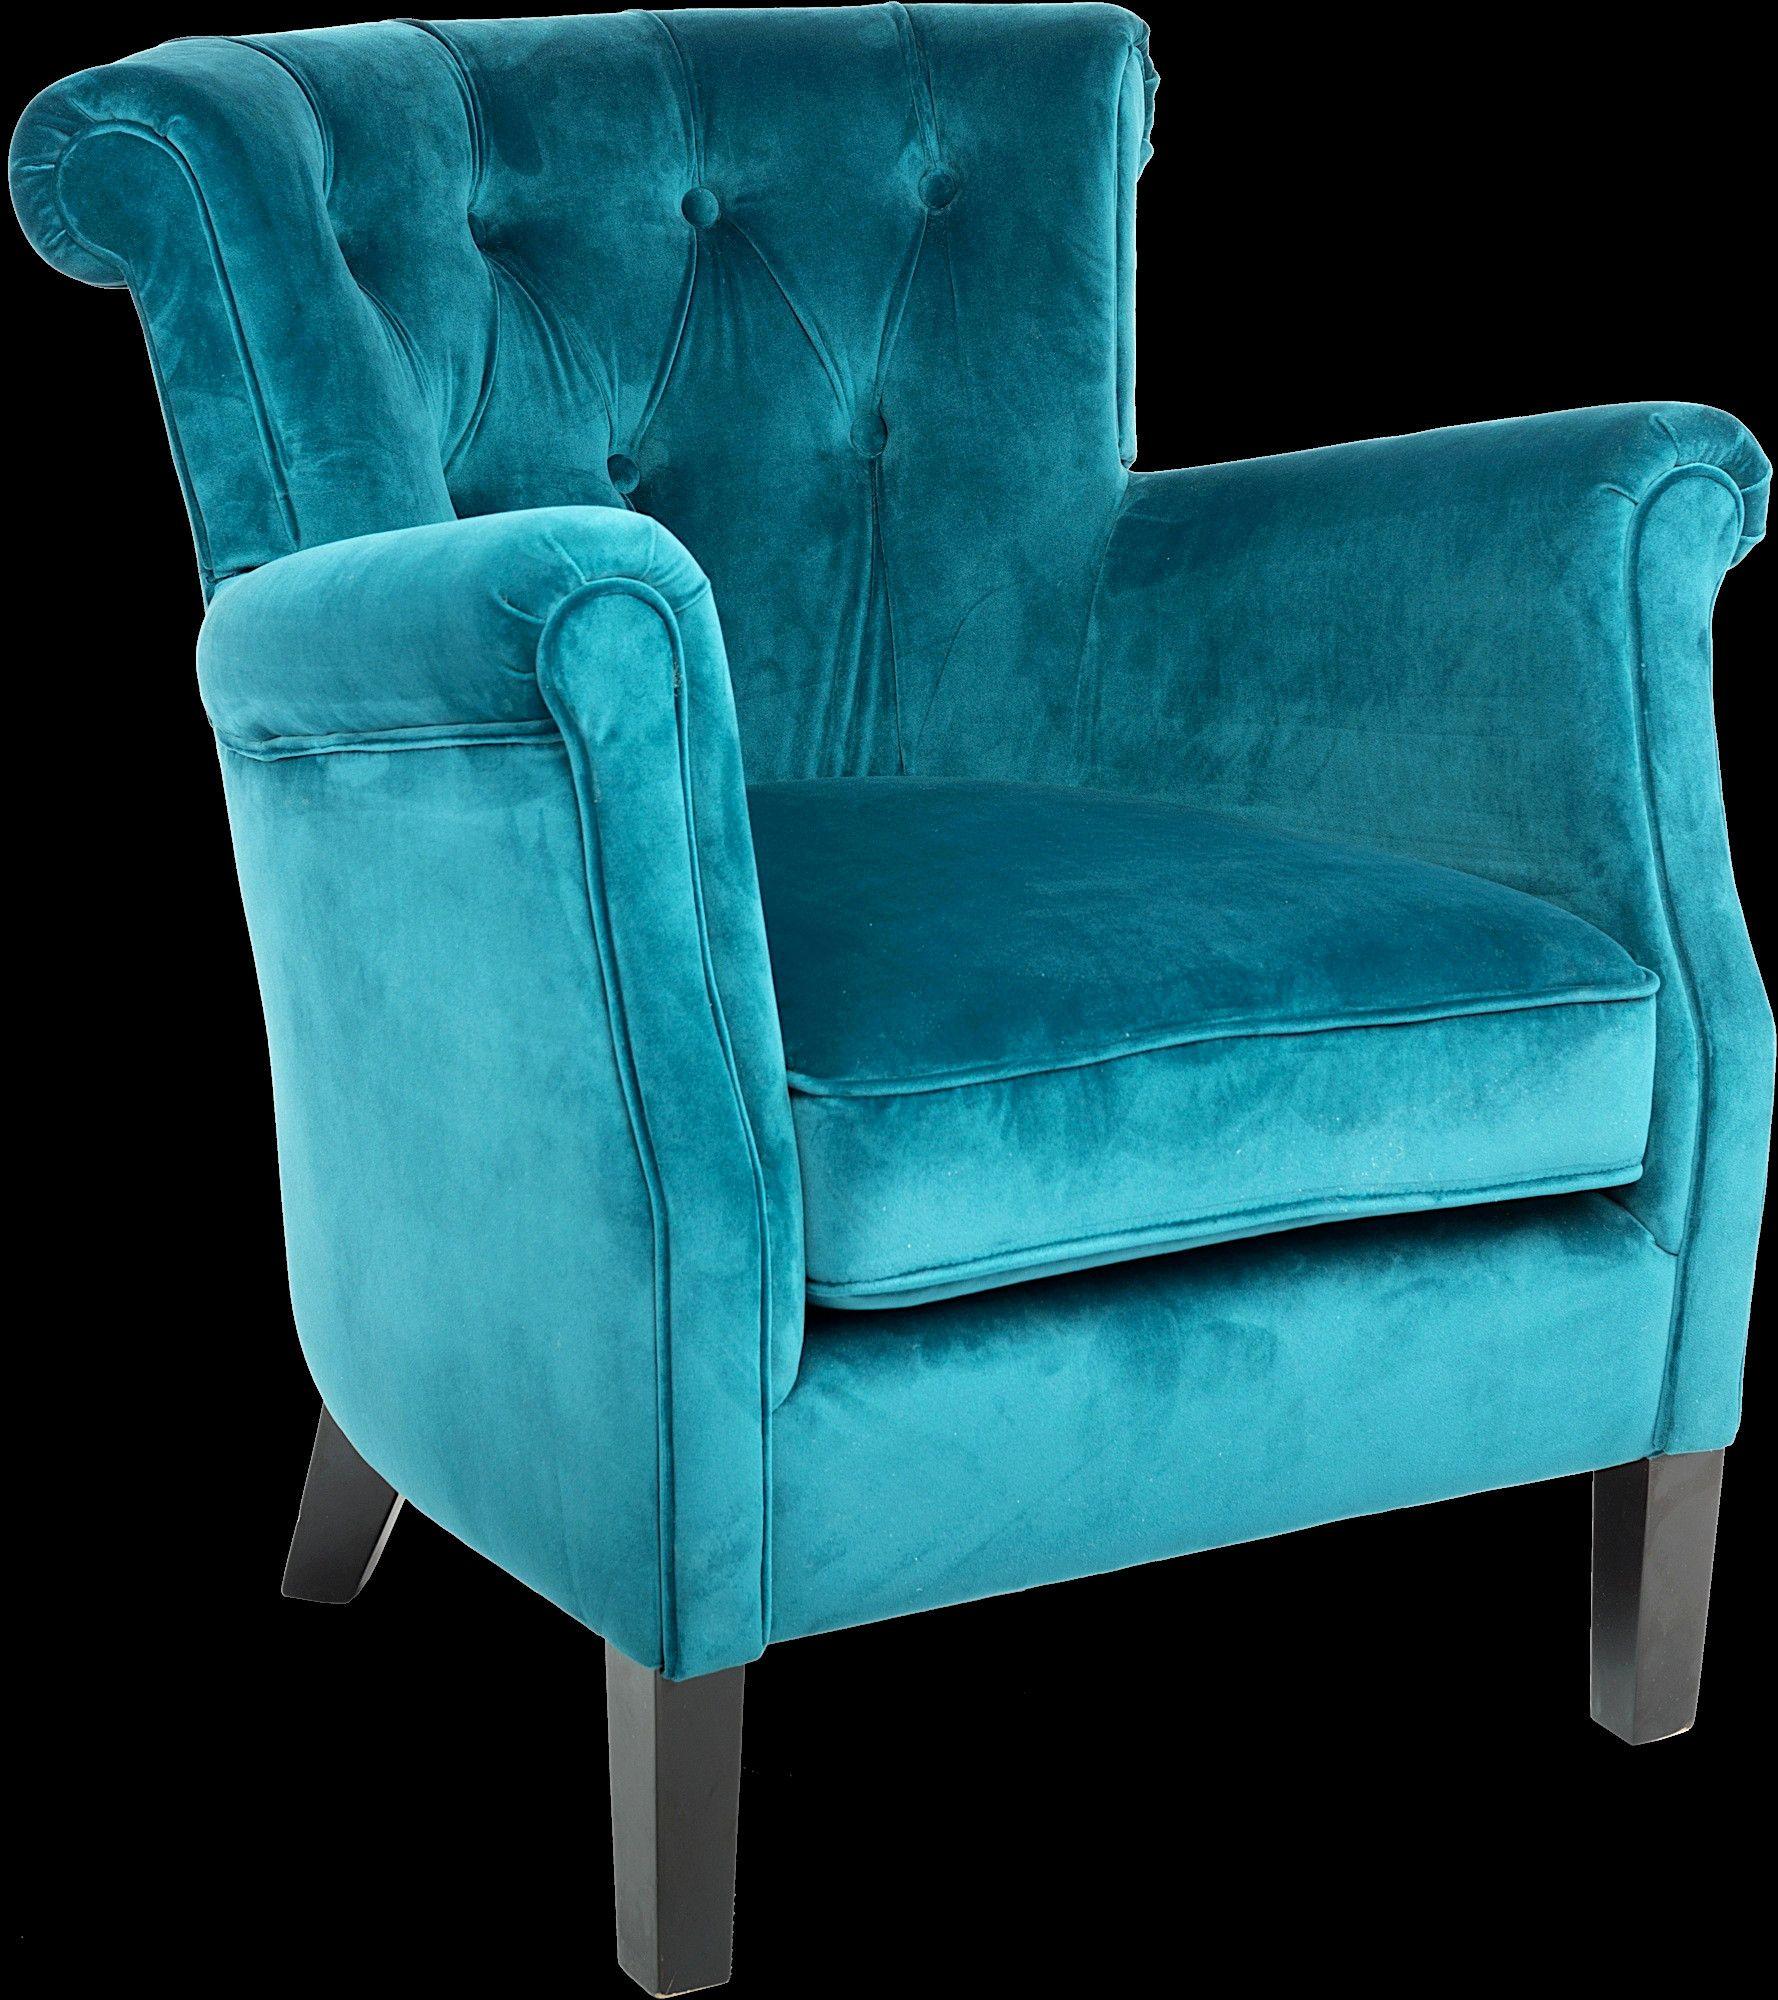 Fresh Fauteuil D Appoint Ikea Wingback Chair Chair Armchair